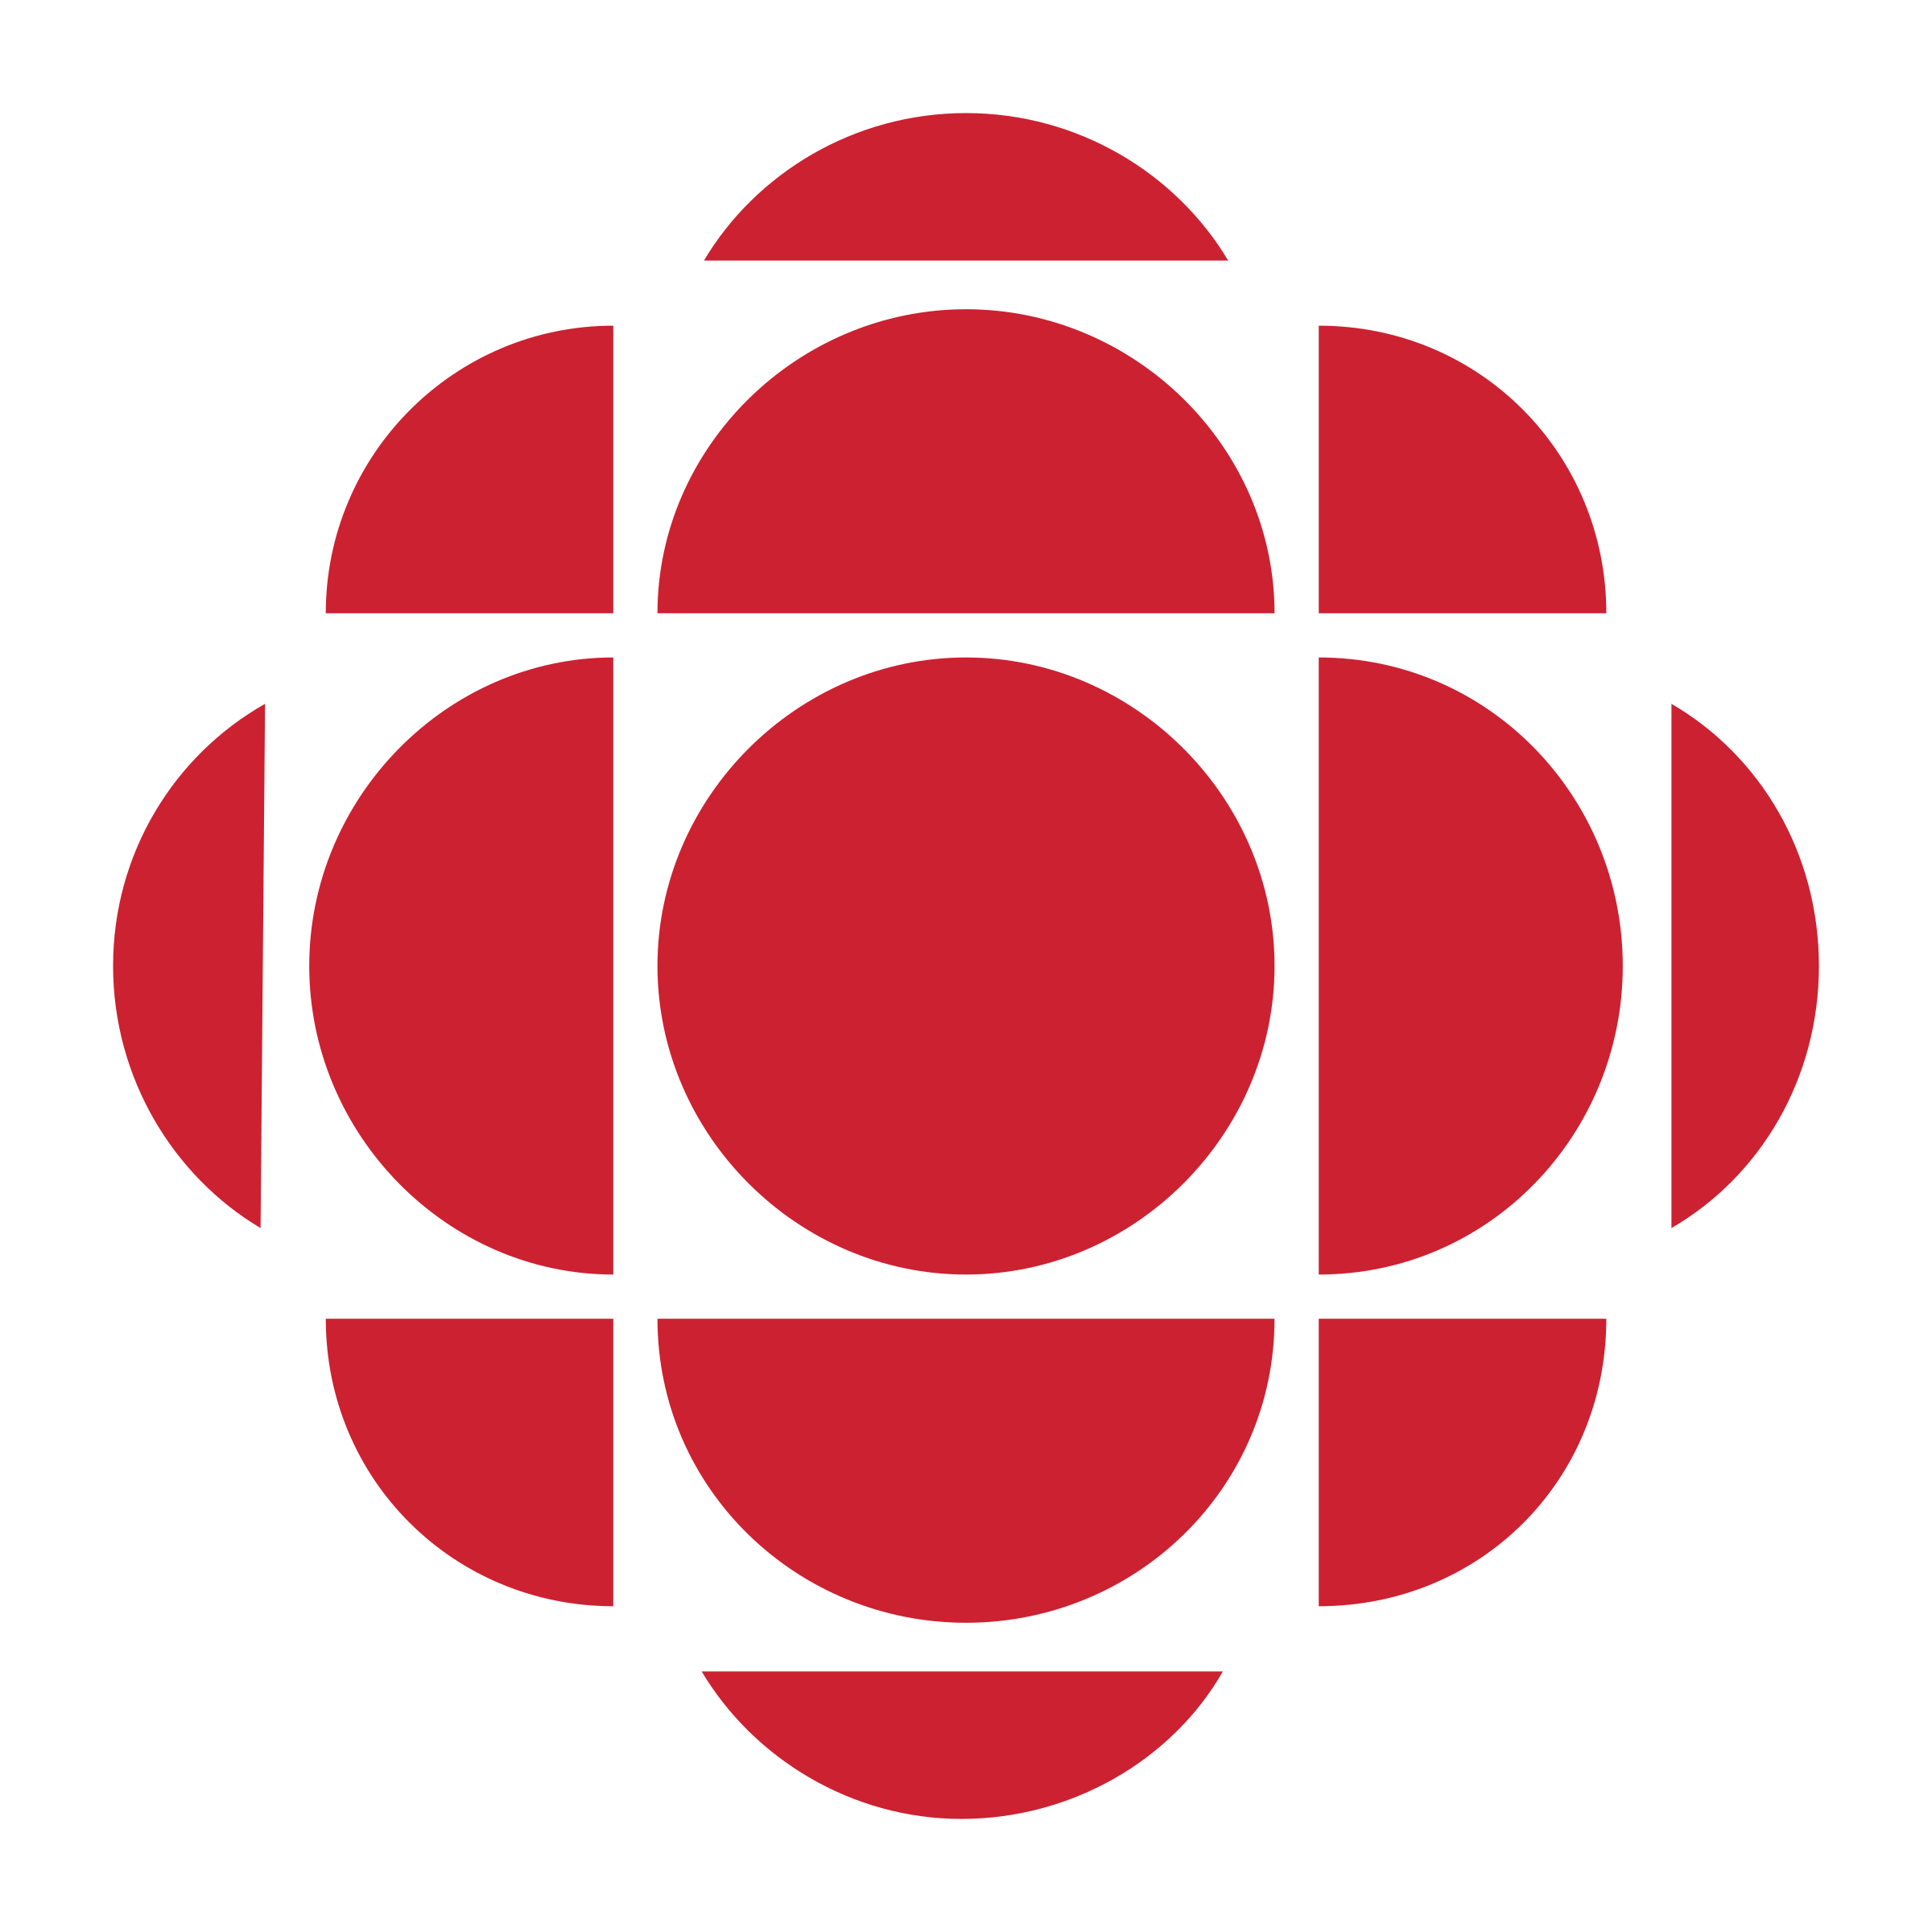 radio-canada-logo-png-transparent